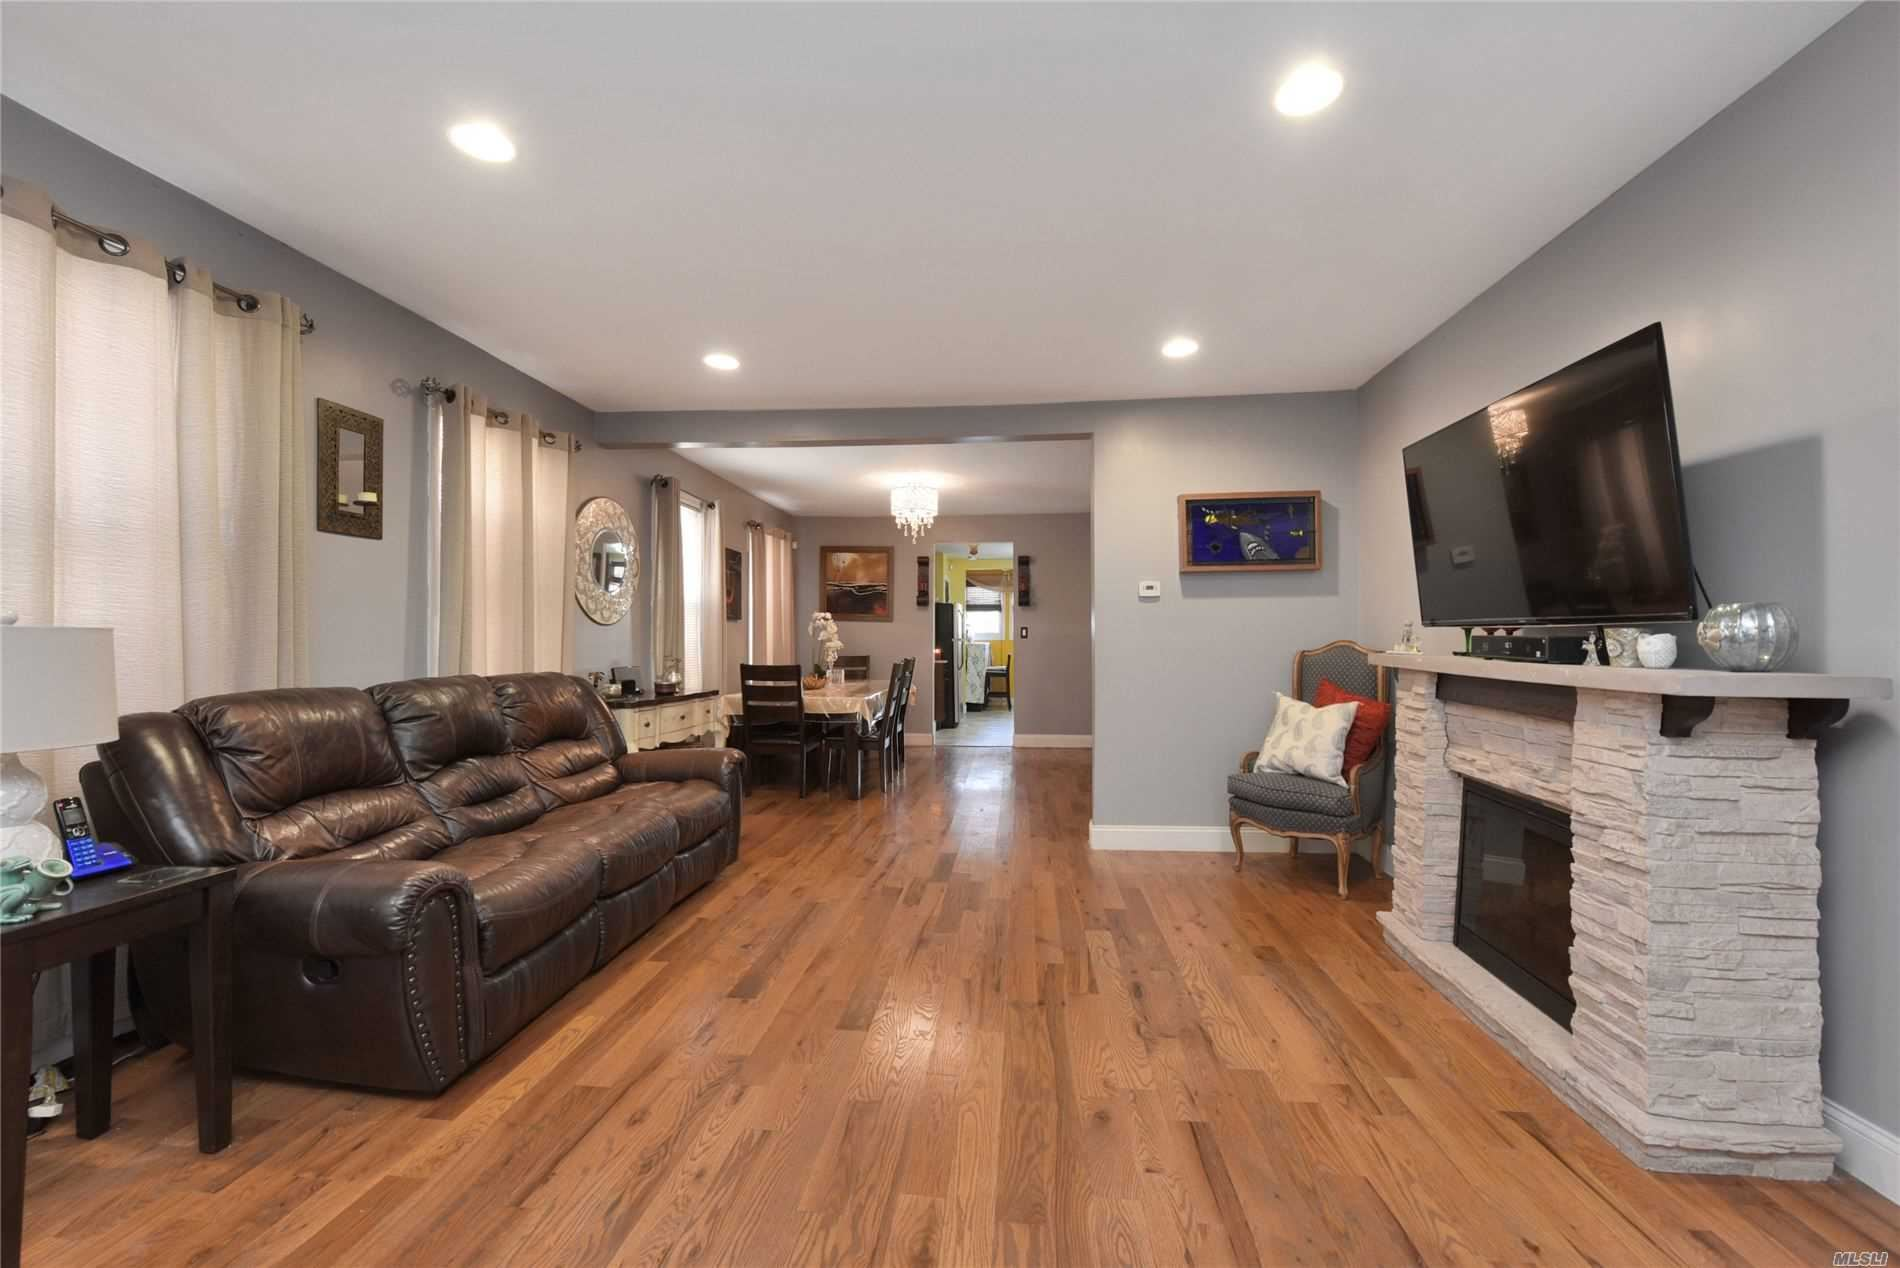 105-66 Van Wyck, Richmond Hill, NY 11418 - MLS#: 3210265